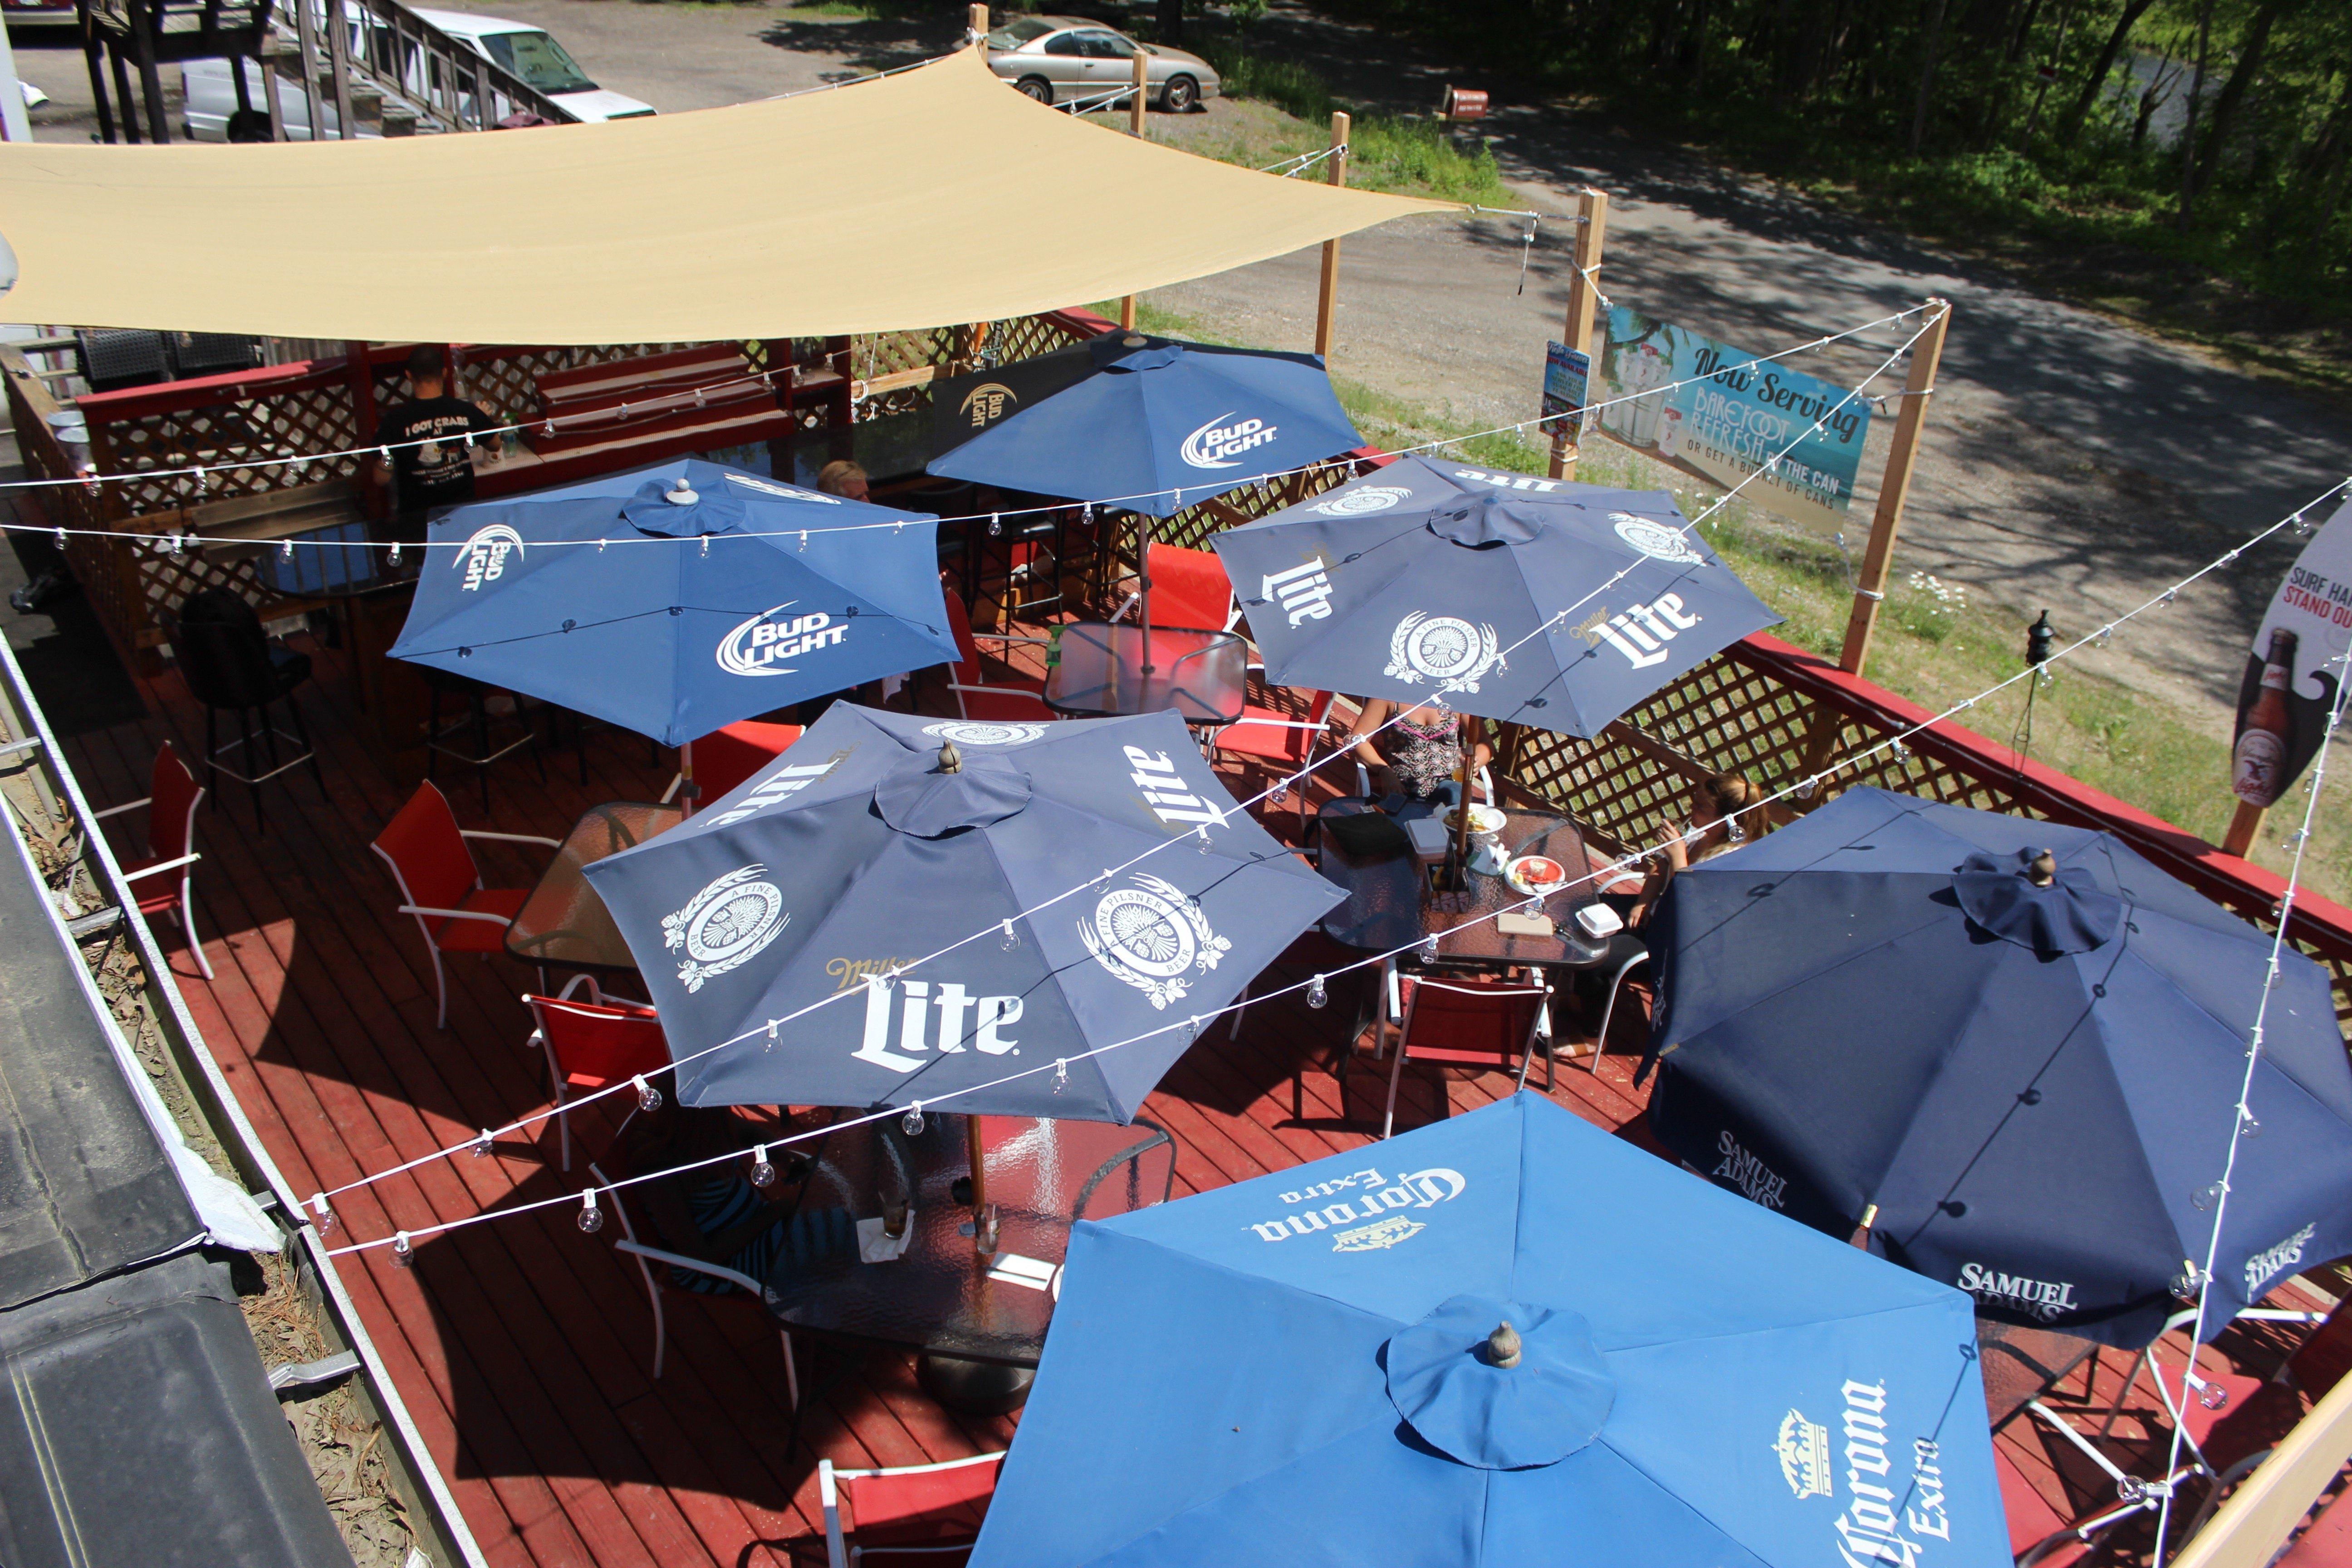 outside deck open in burriville nasonville north smithfield woonsocket